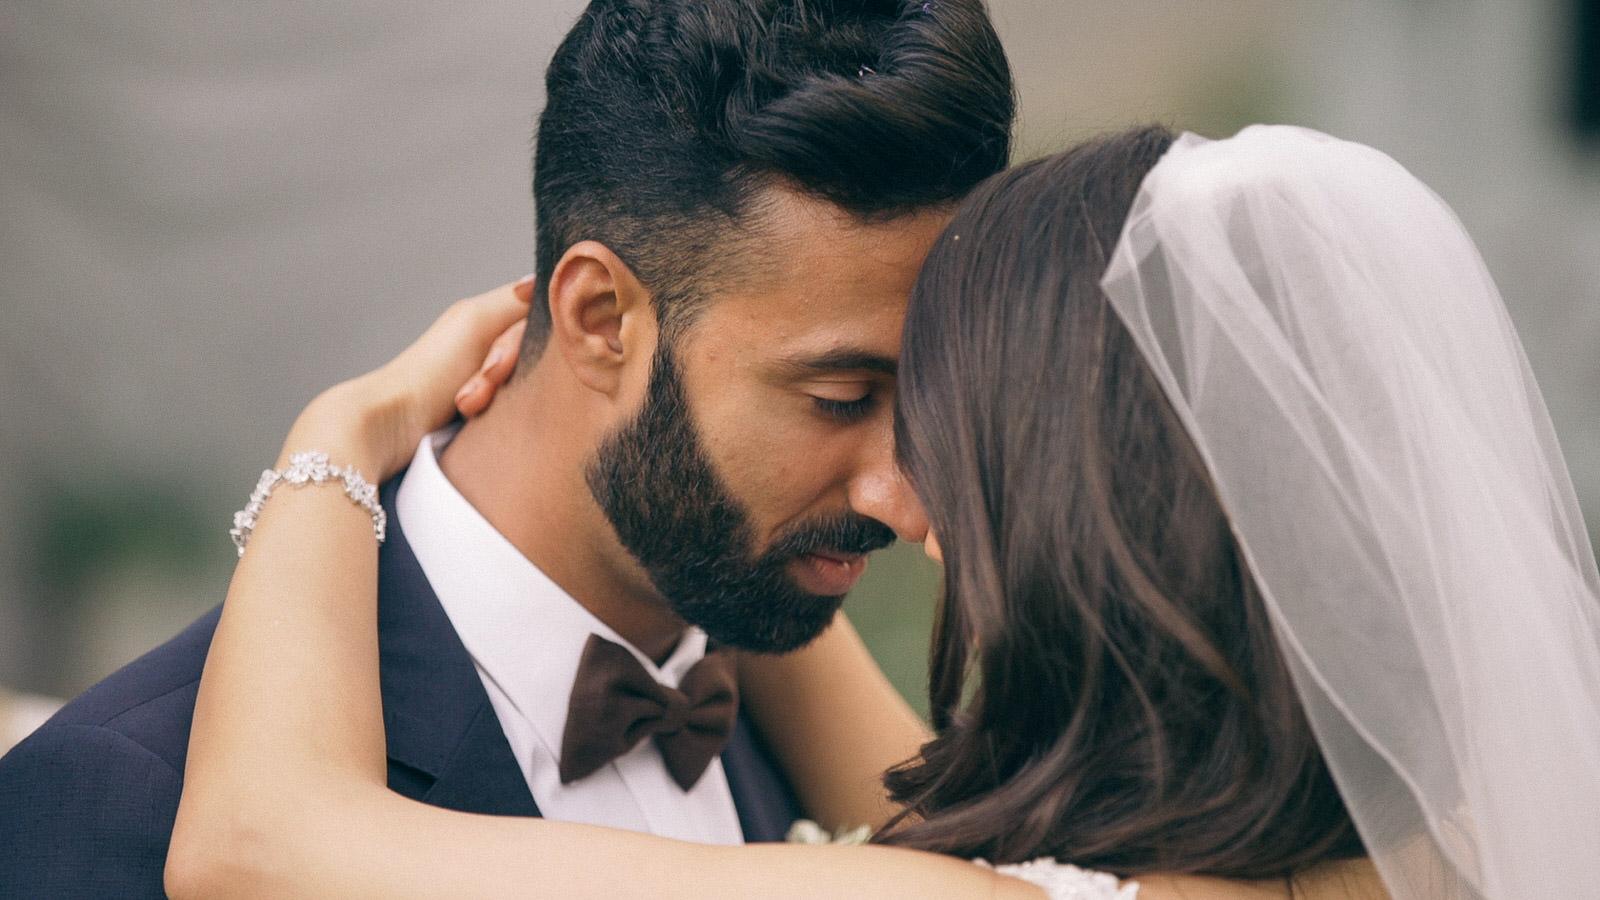 Somerset Wedding Videography.jpg